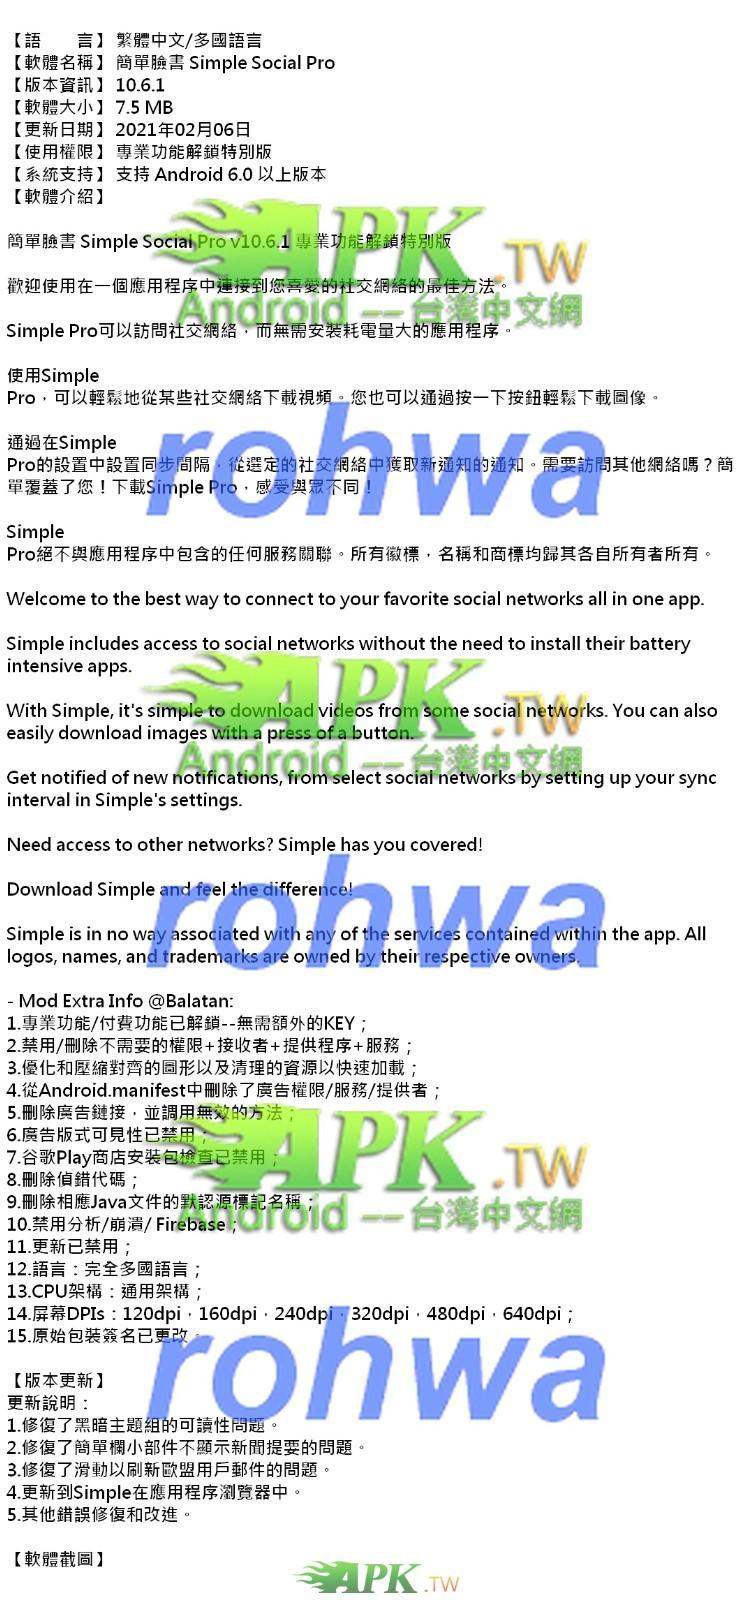 Simple_Pro_10.6.1_.jpg